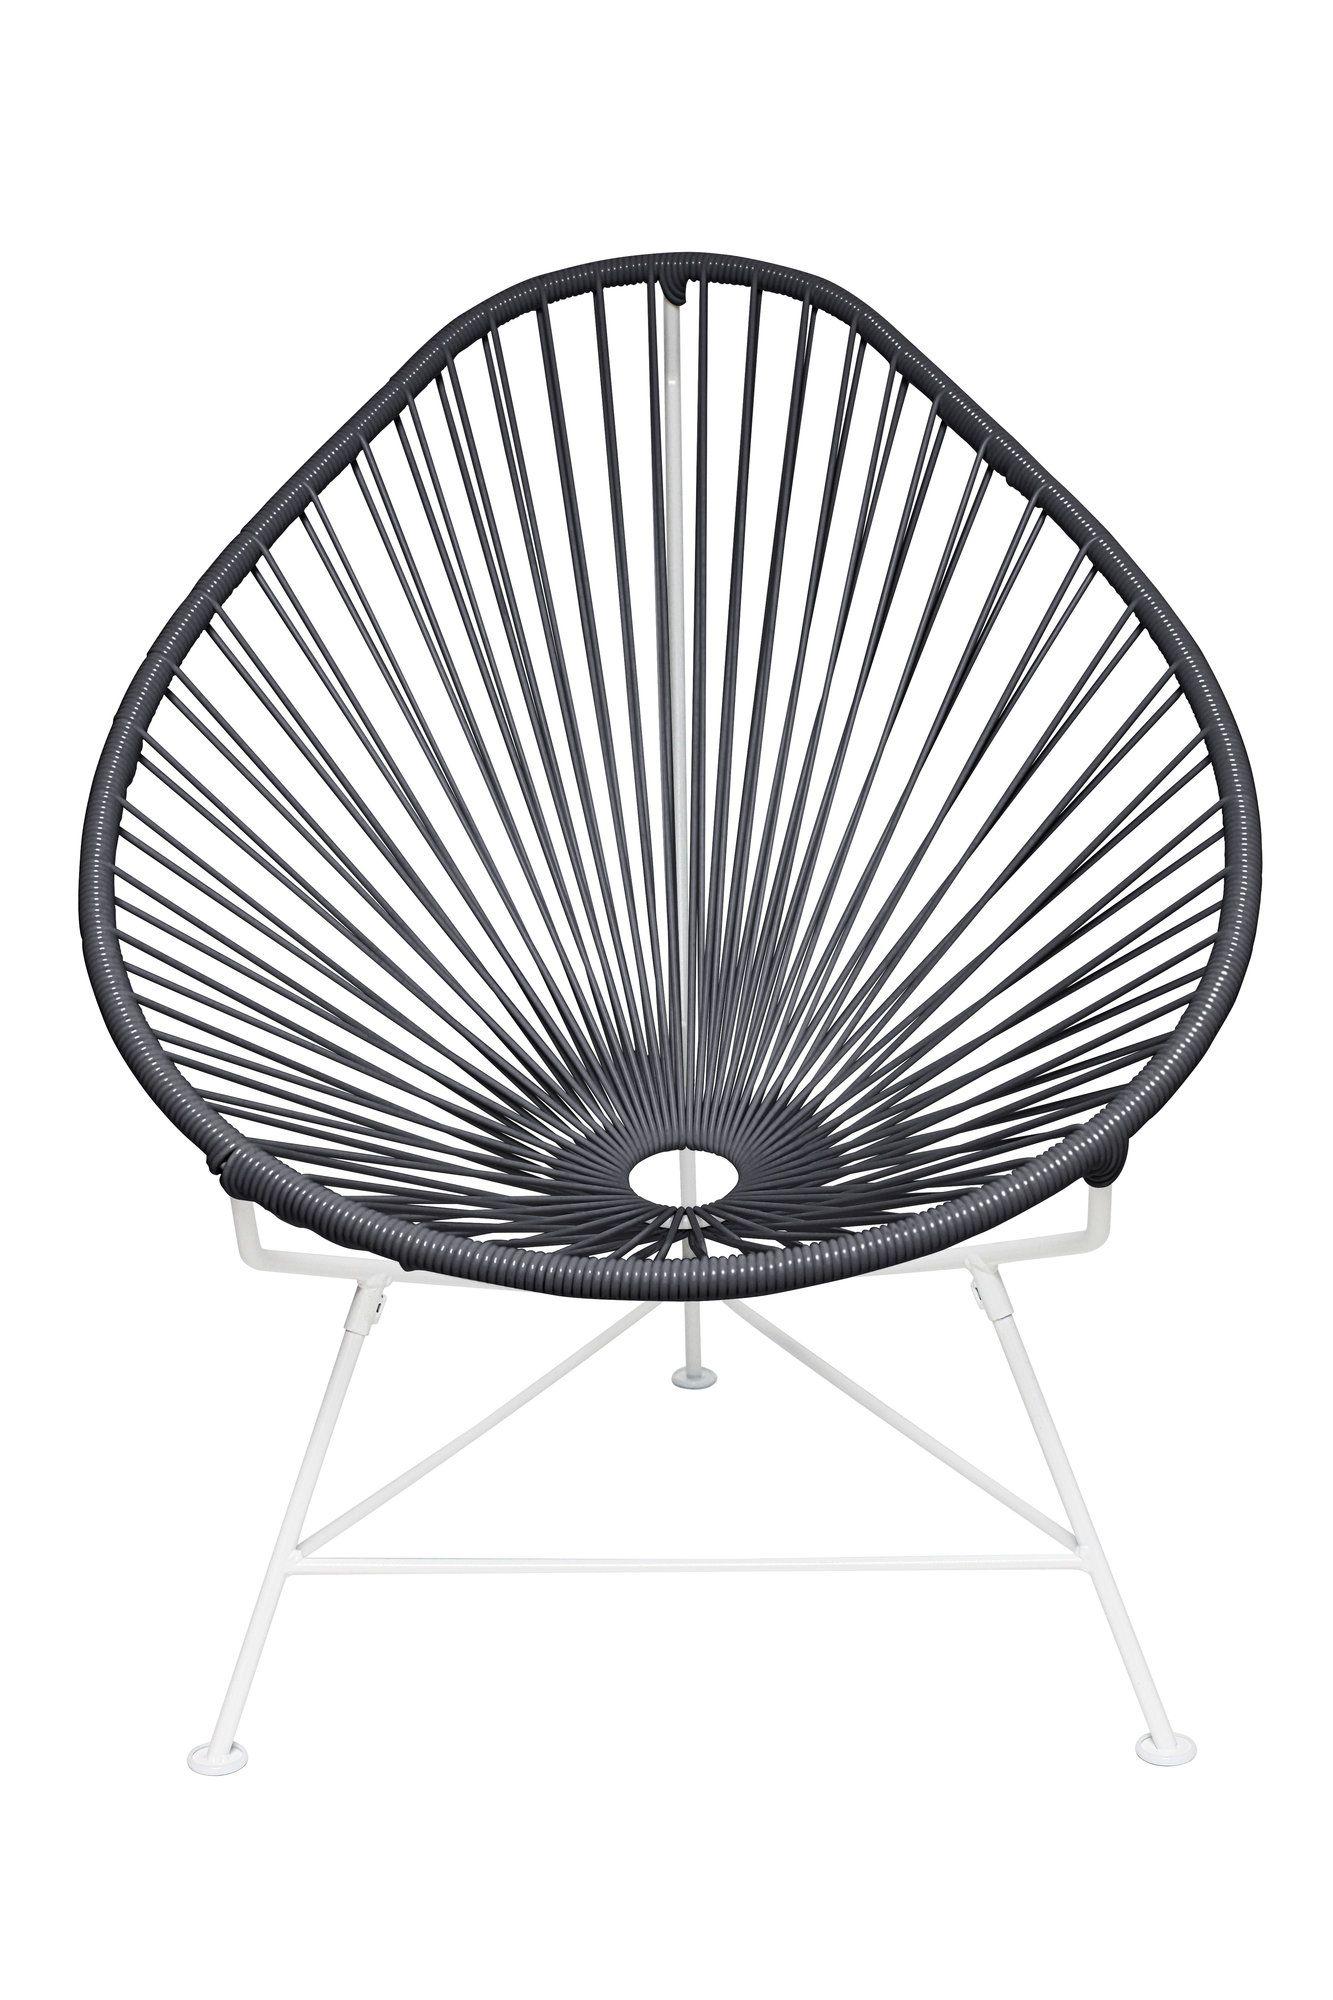 Canela Steel & Vinyl Papasan Chair   Products   Pinterest